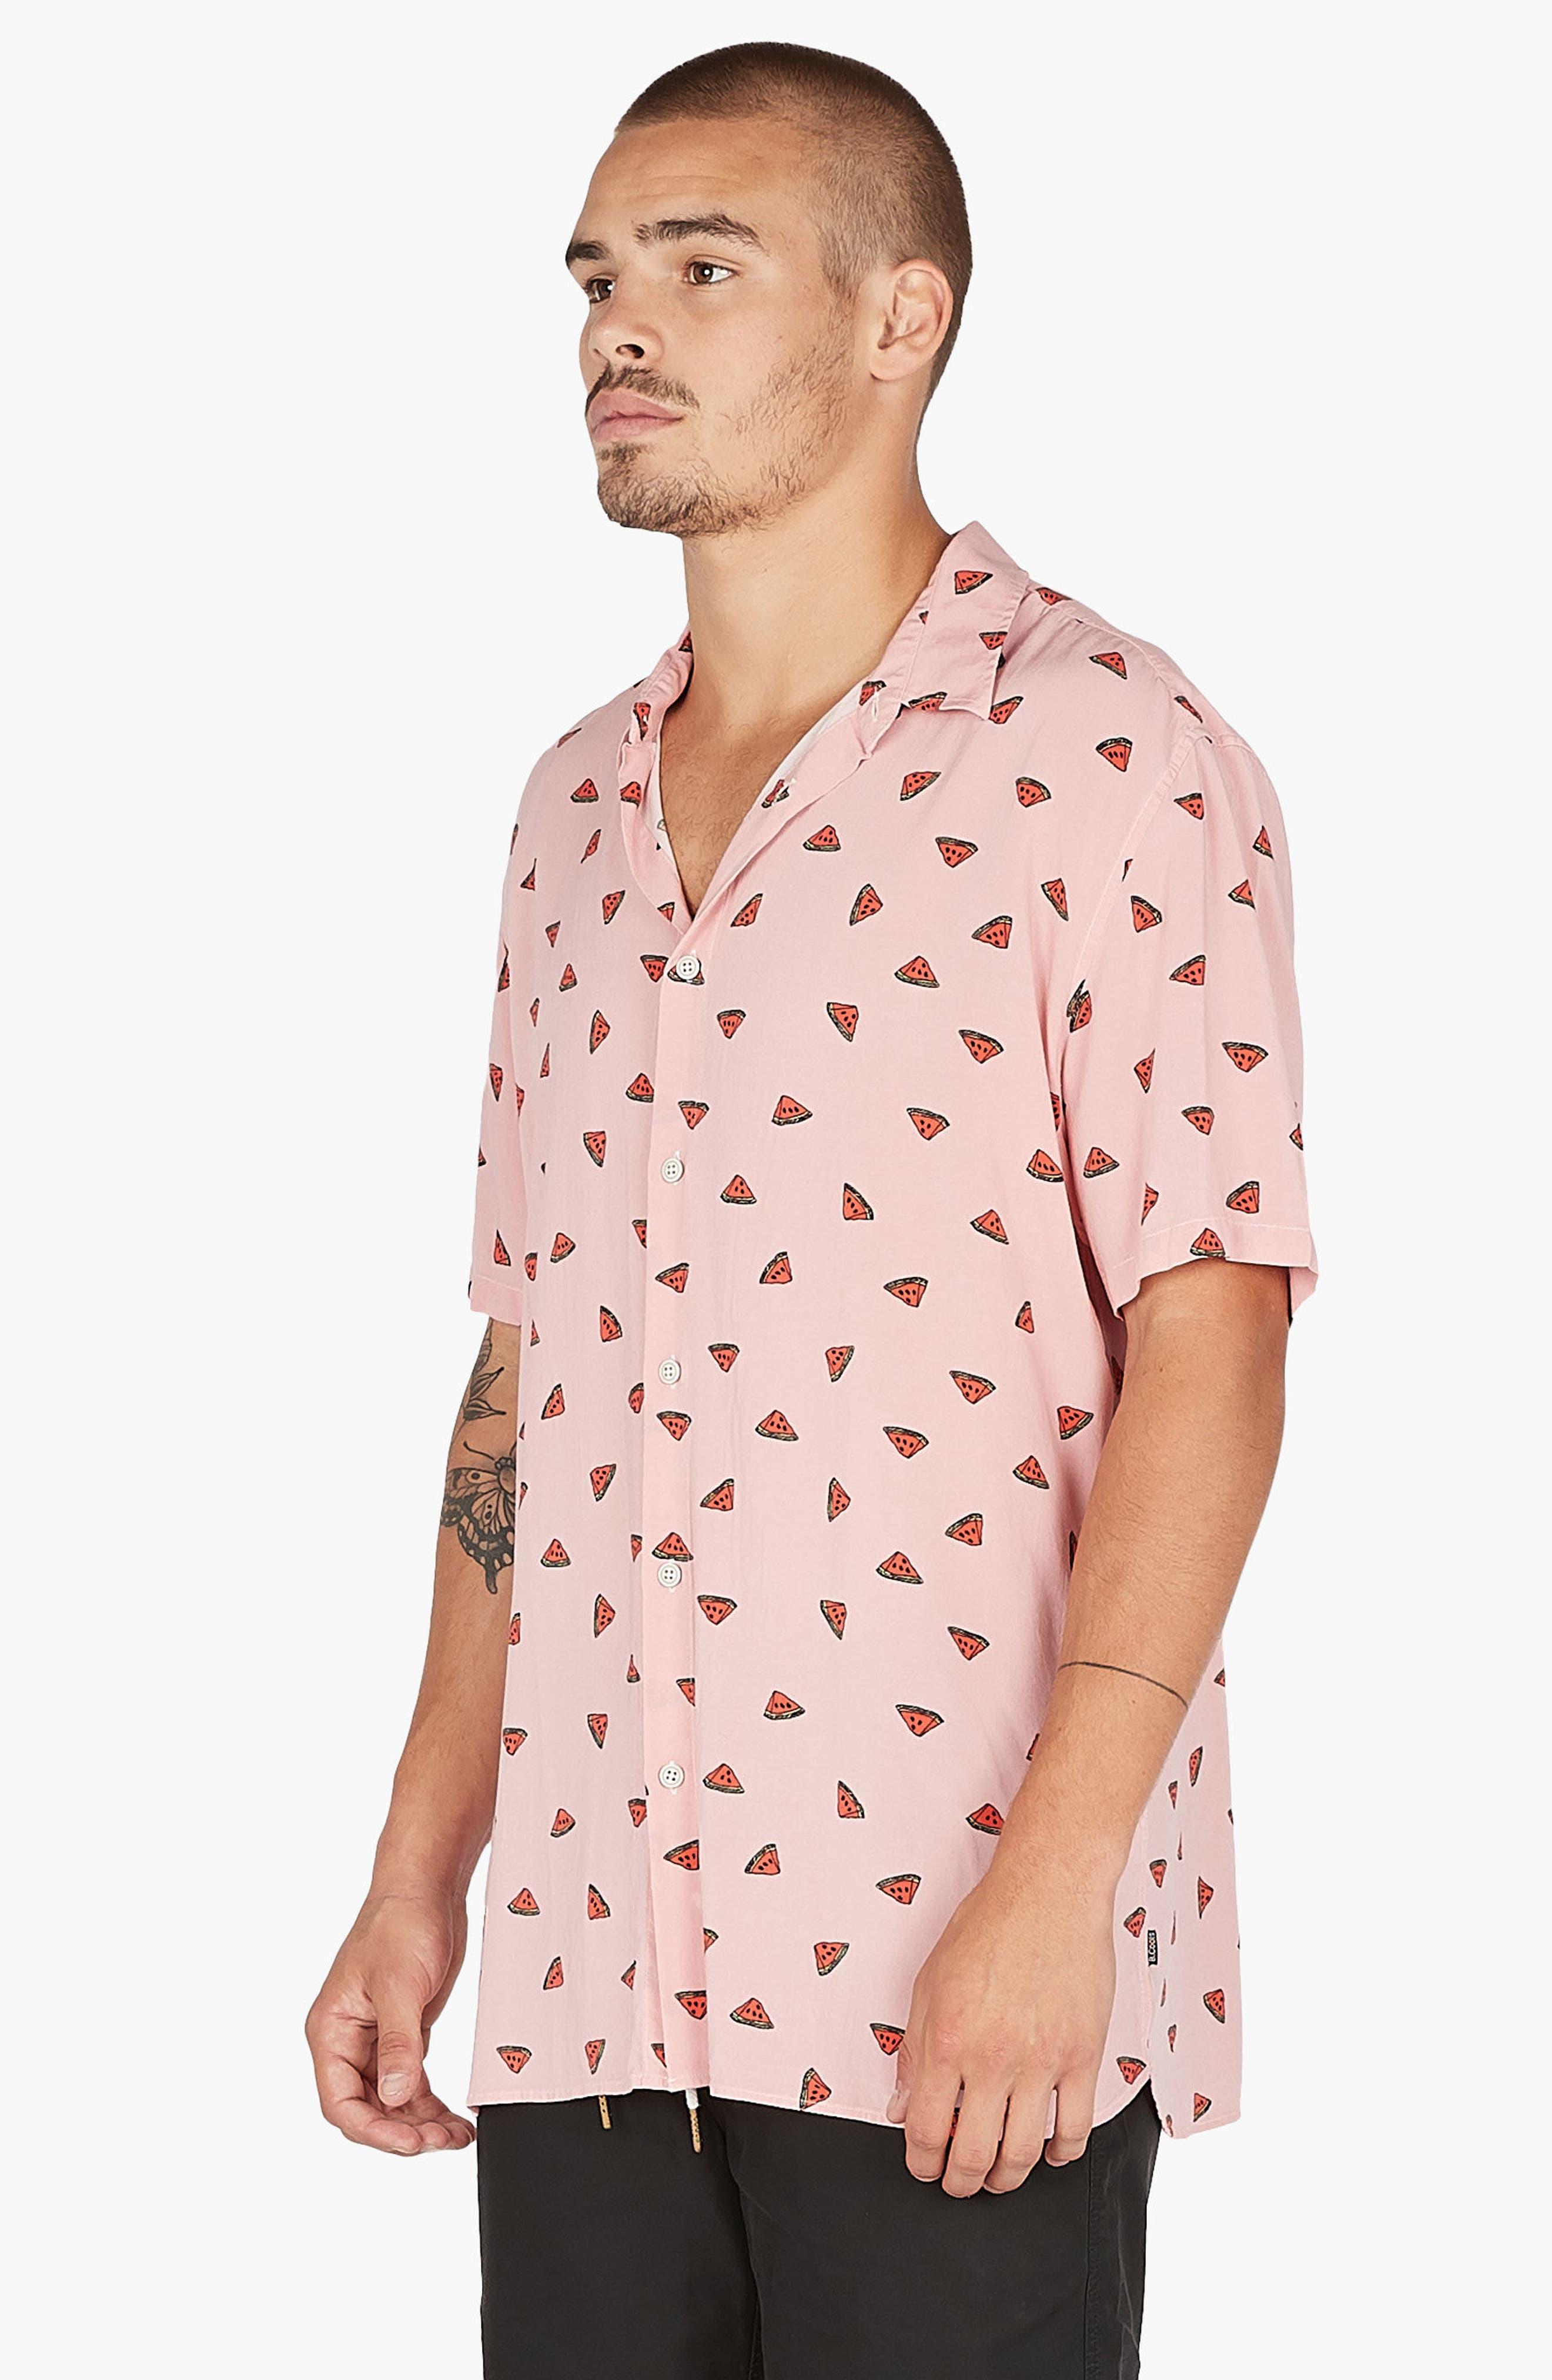 Holiday Woven Shirt,                             Alternate thumbnail 2, color,                             Pink Watermelon